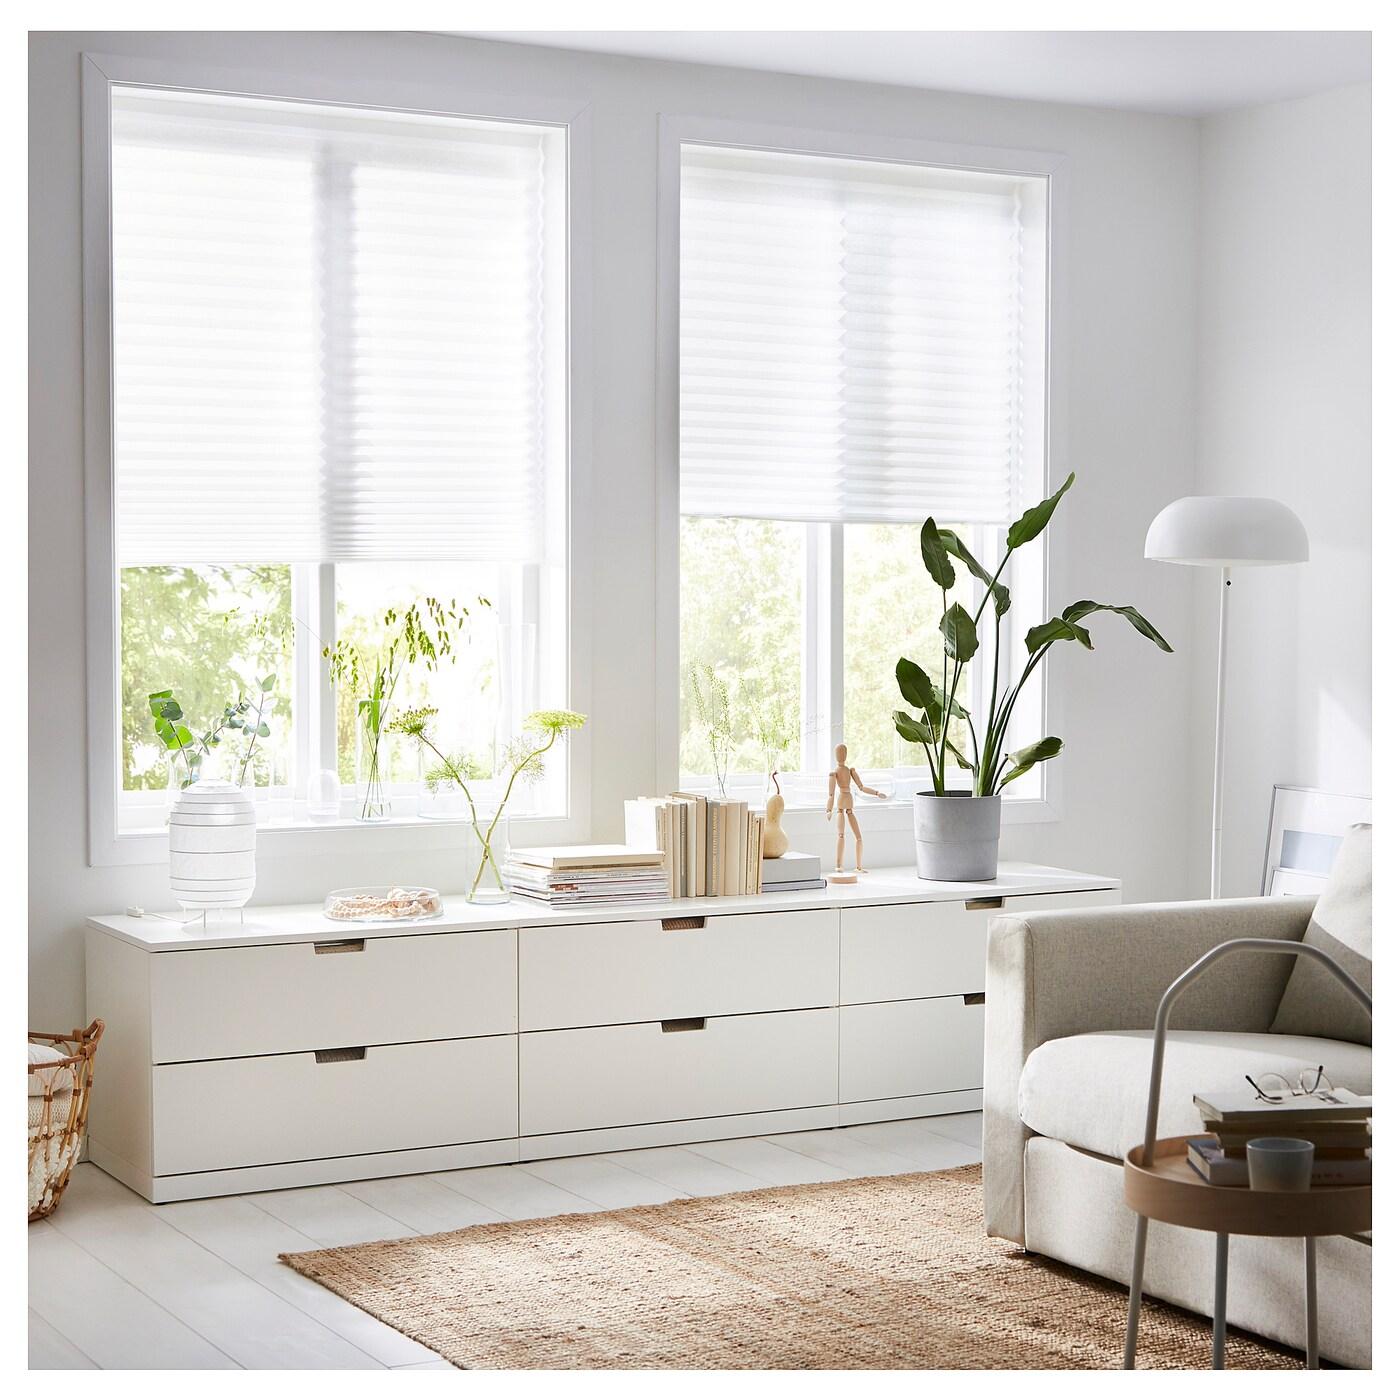 SCHOTTIS Pleated blind - white 10x110 cm